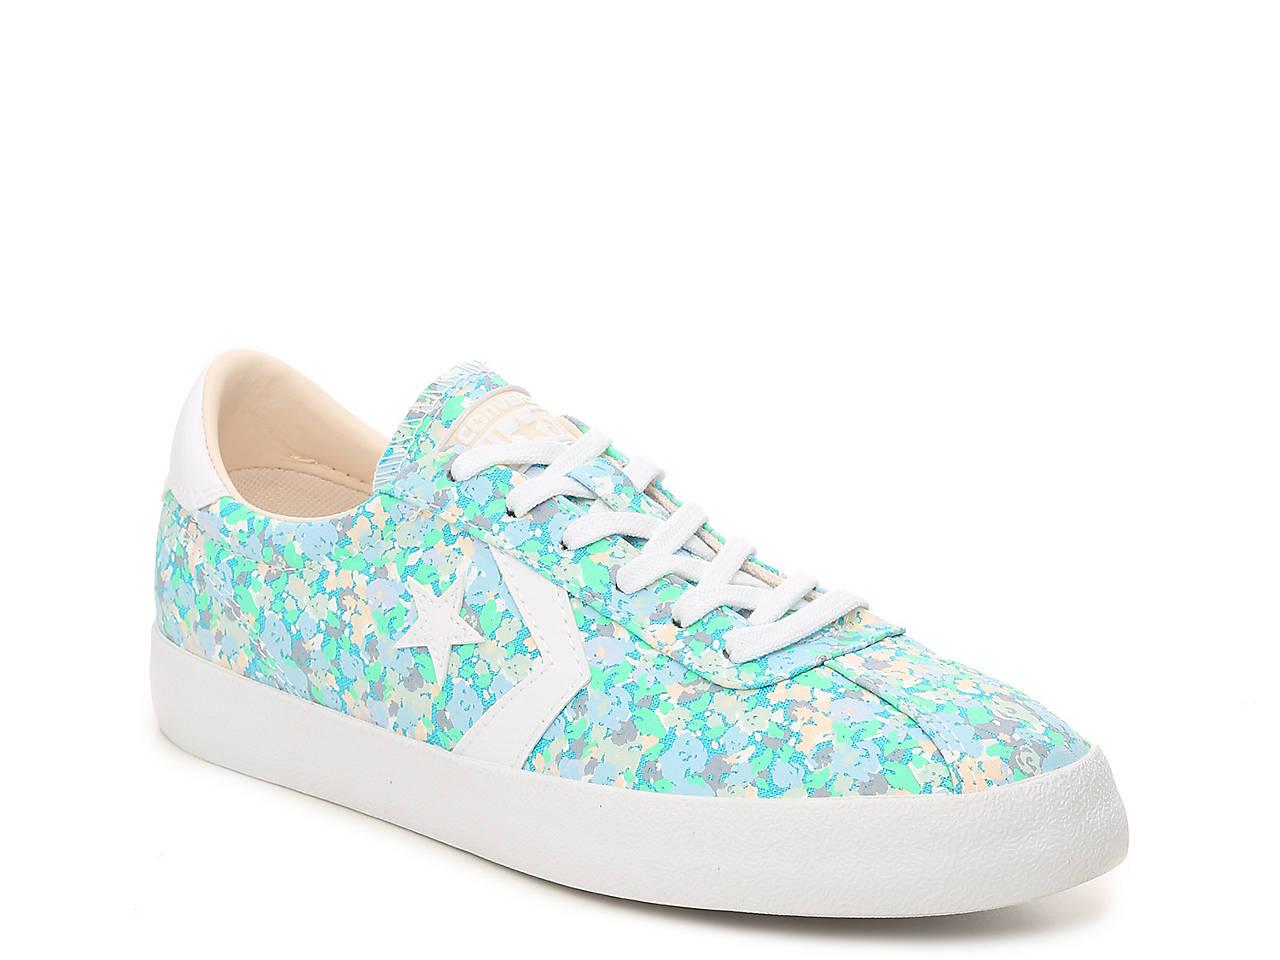 Converse Floral Breakpoint Sneaker - Women s Women s Shoes  924c9cbe7